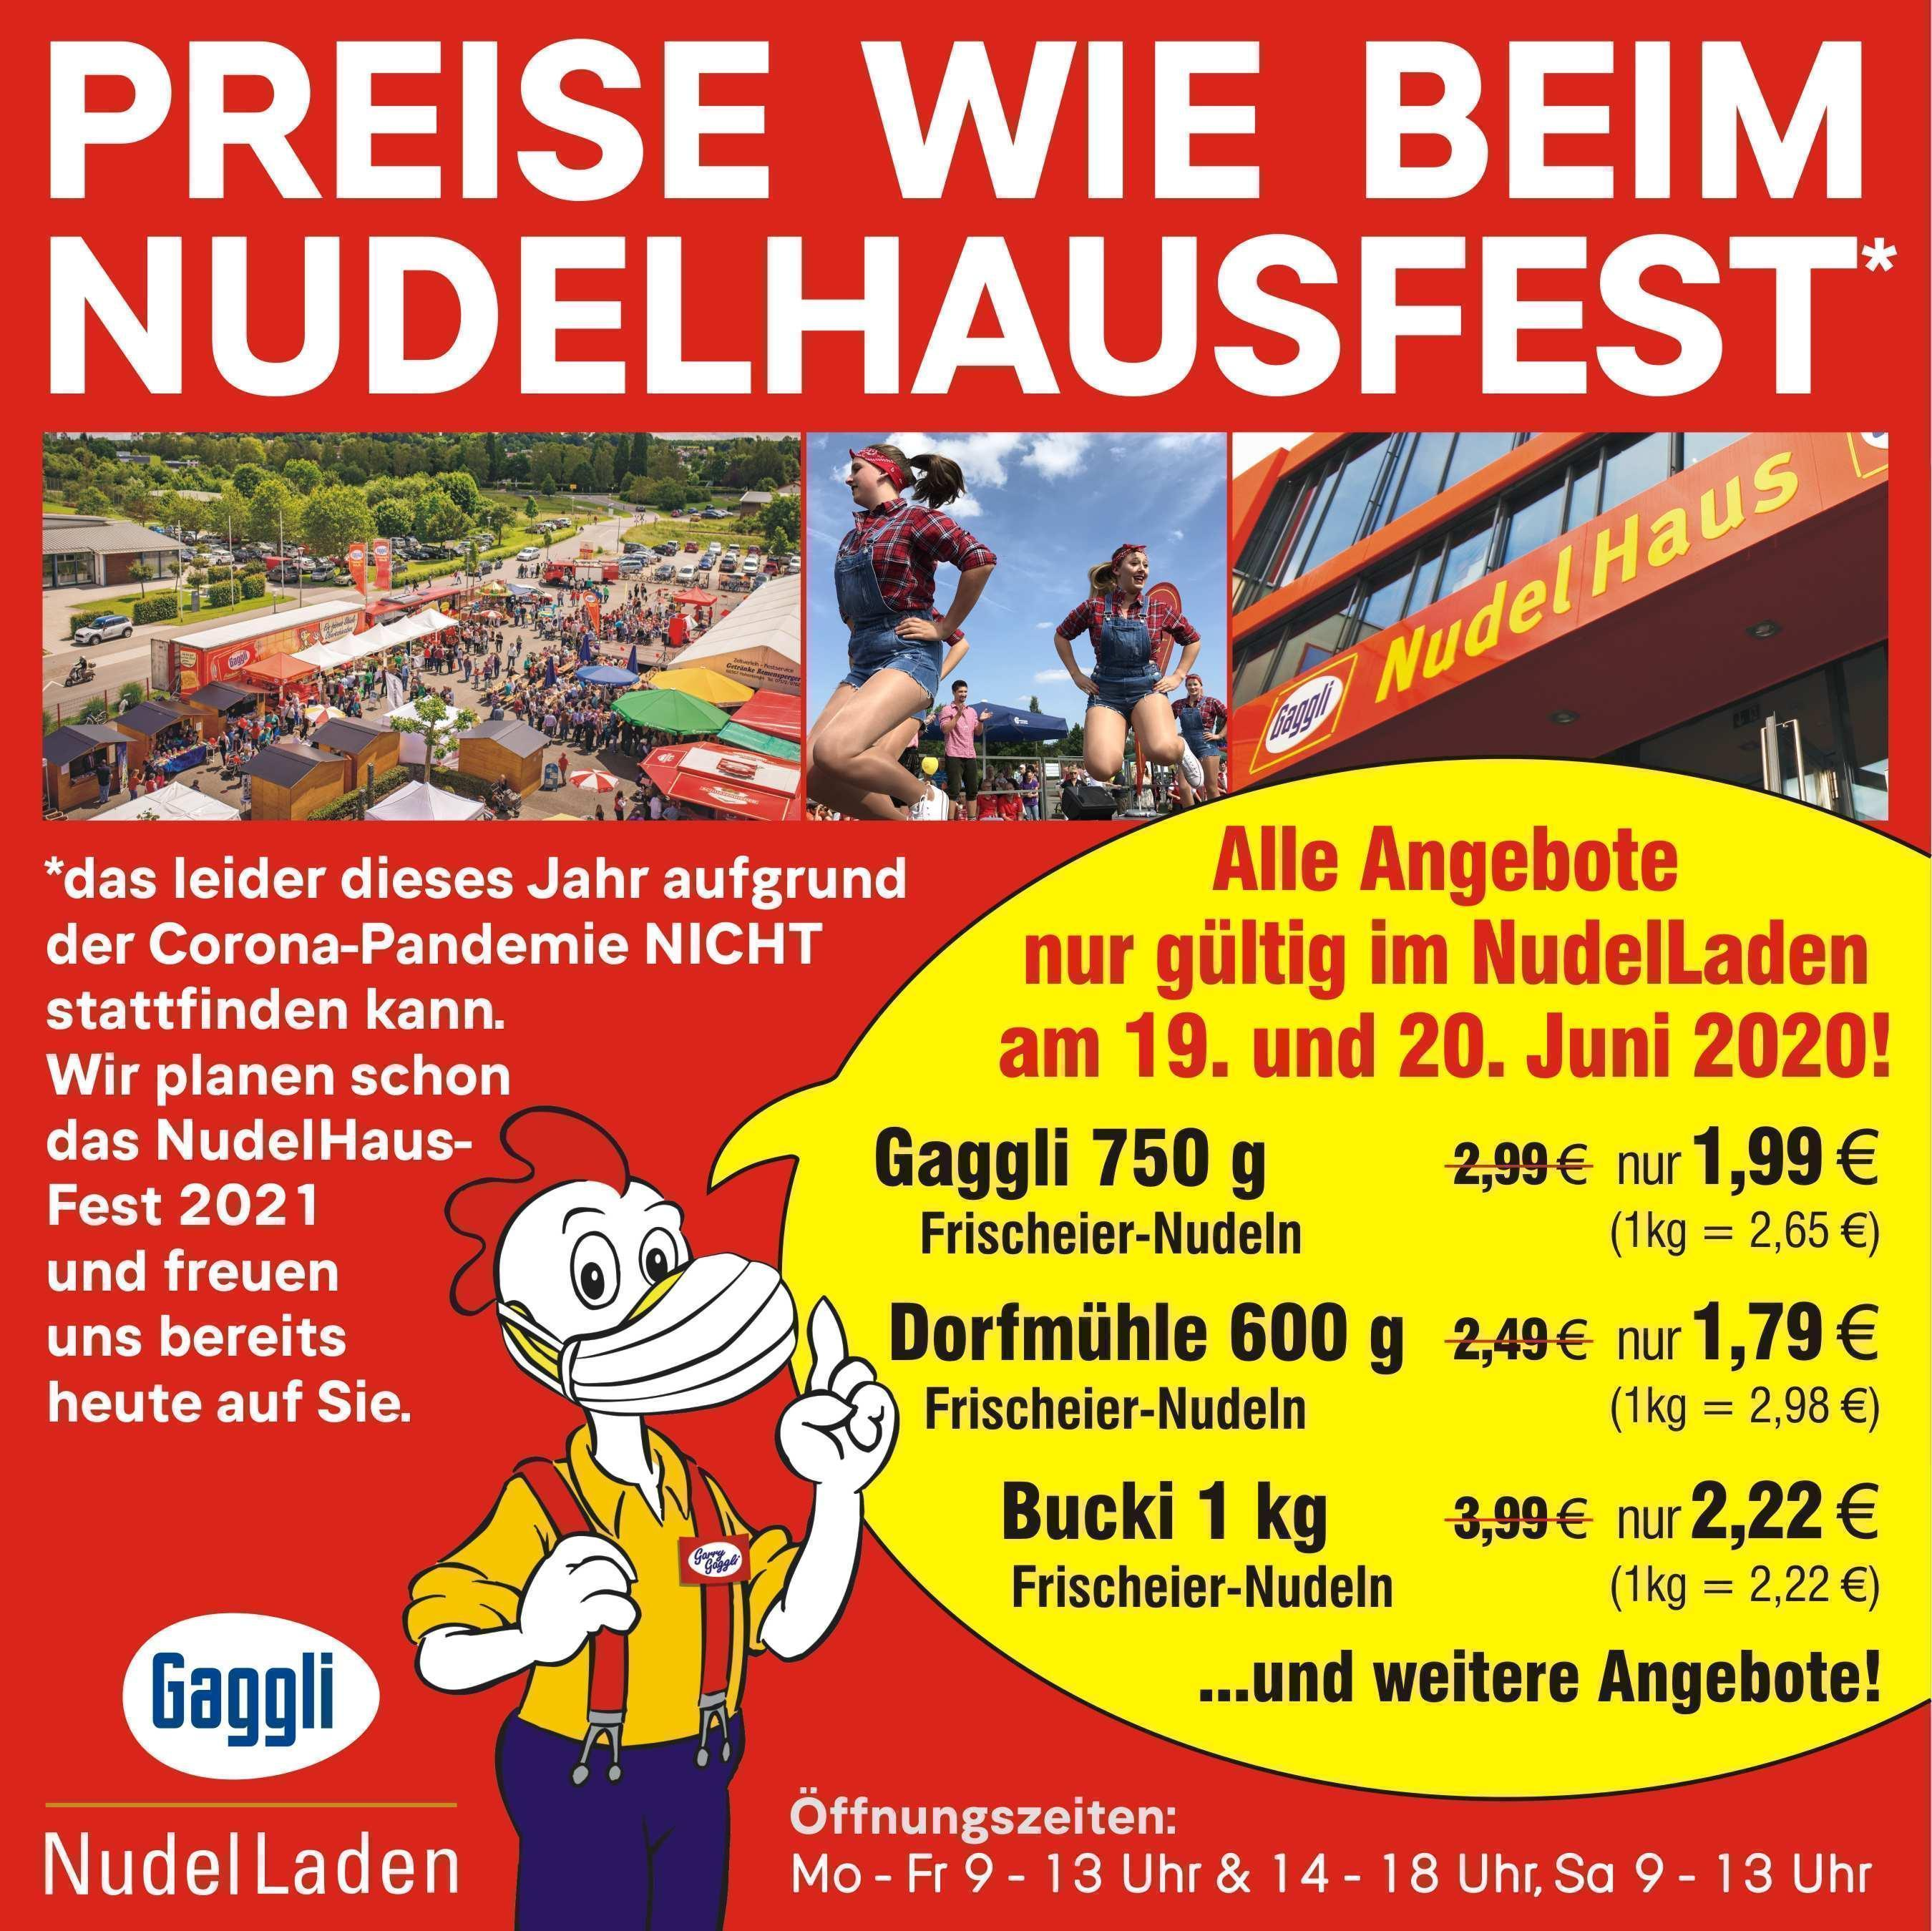 NudelHaus-Fest